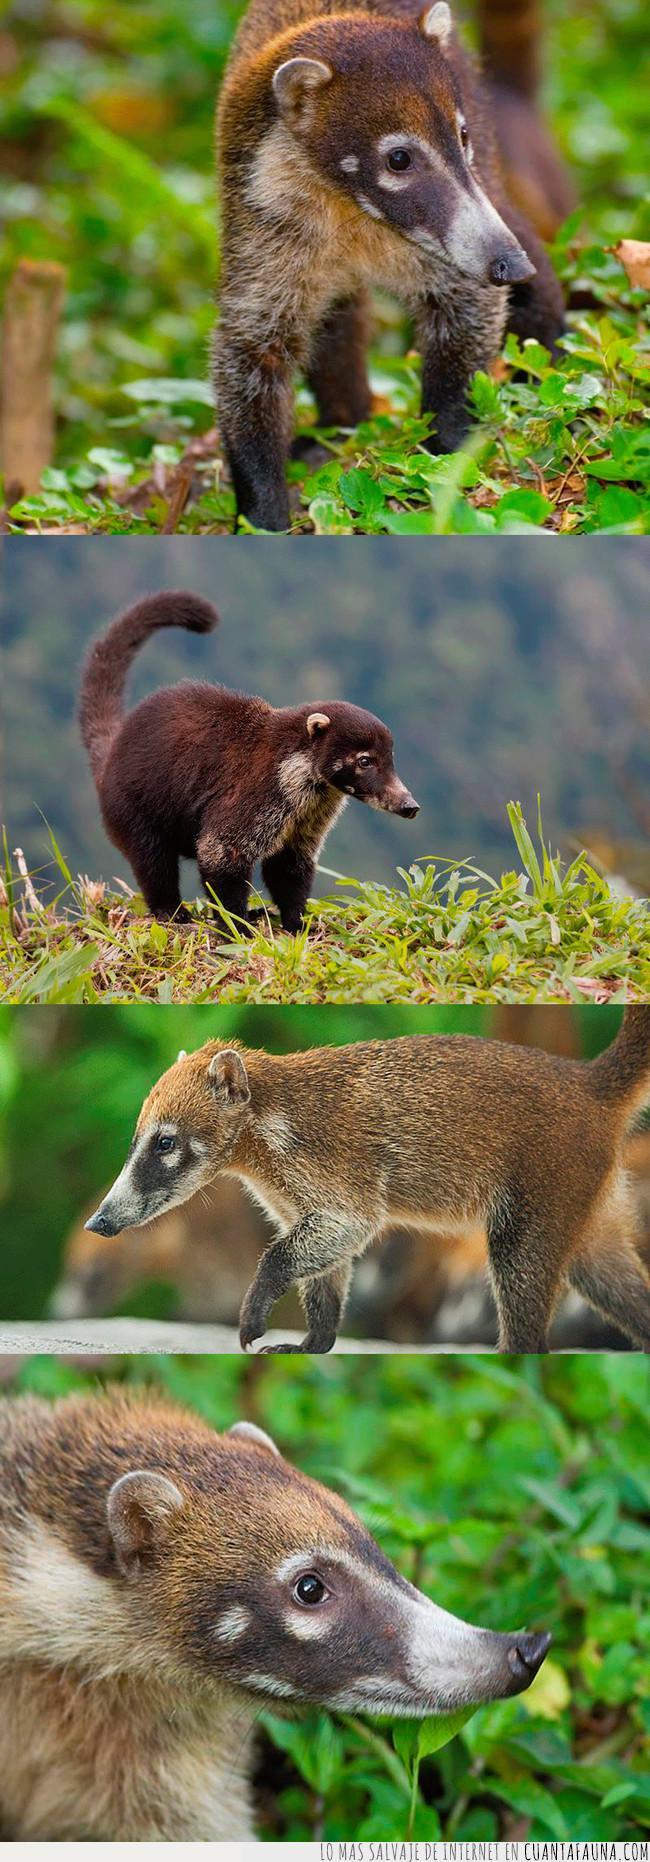 animal,coatimundi,favorito,mamífero,nuevo